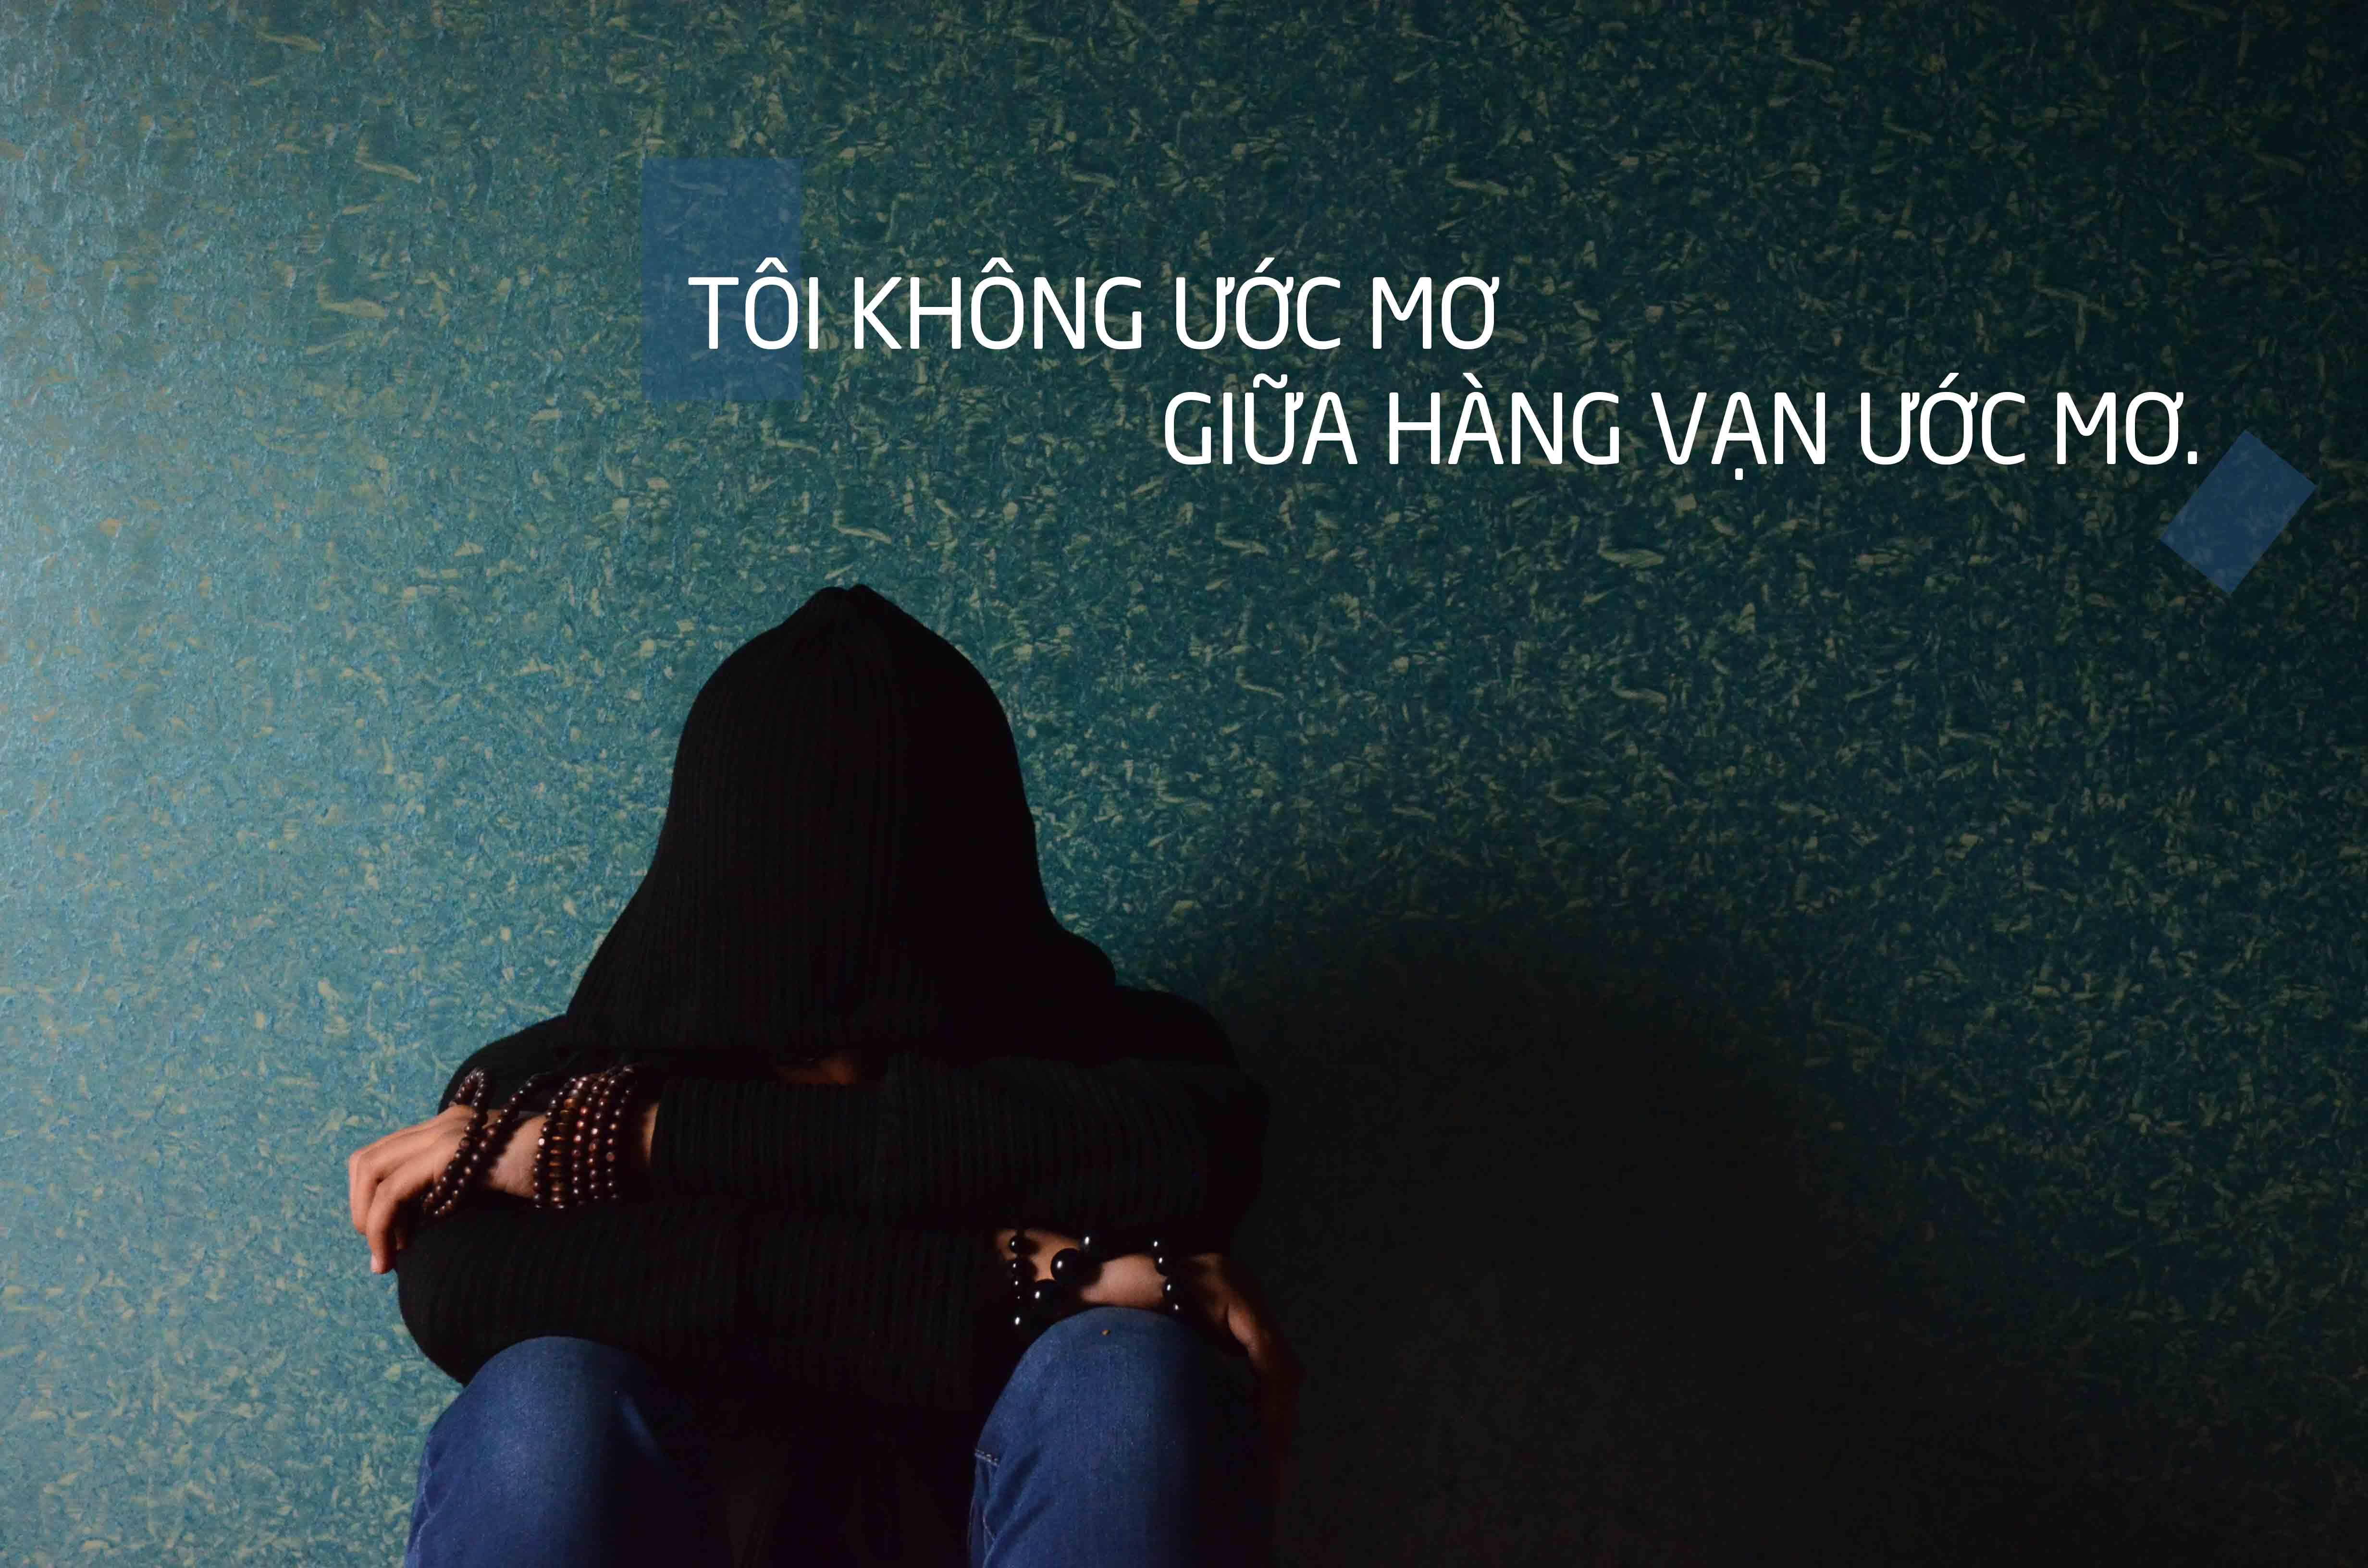 toi-khong-uoc-mo-giua-hang-van-uoc-mo